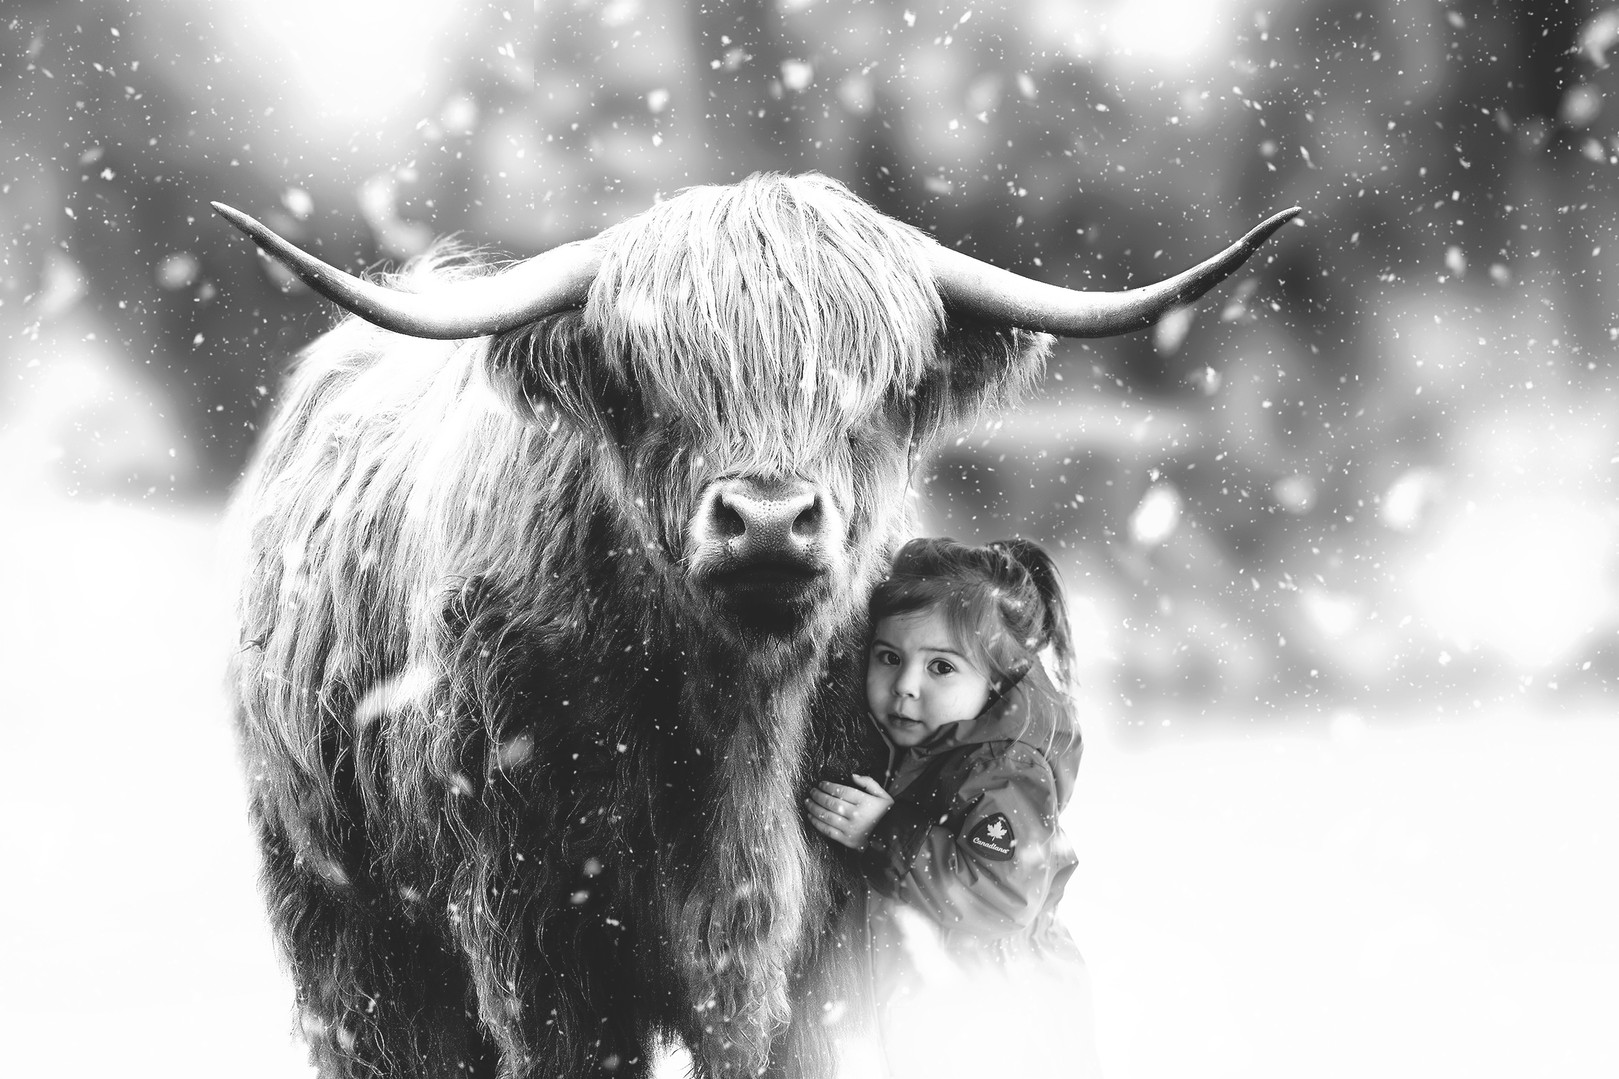 muskoka winter digital painting bull and girl cuddle